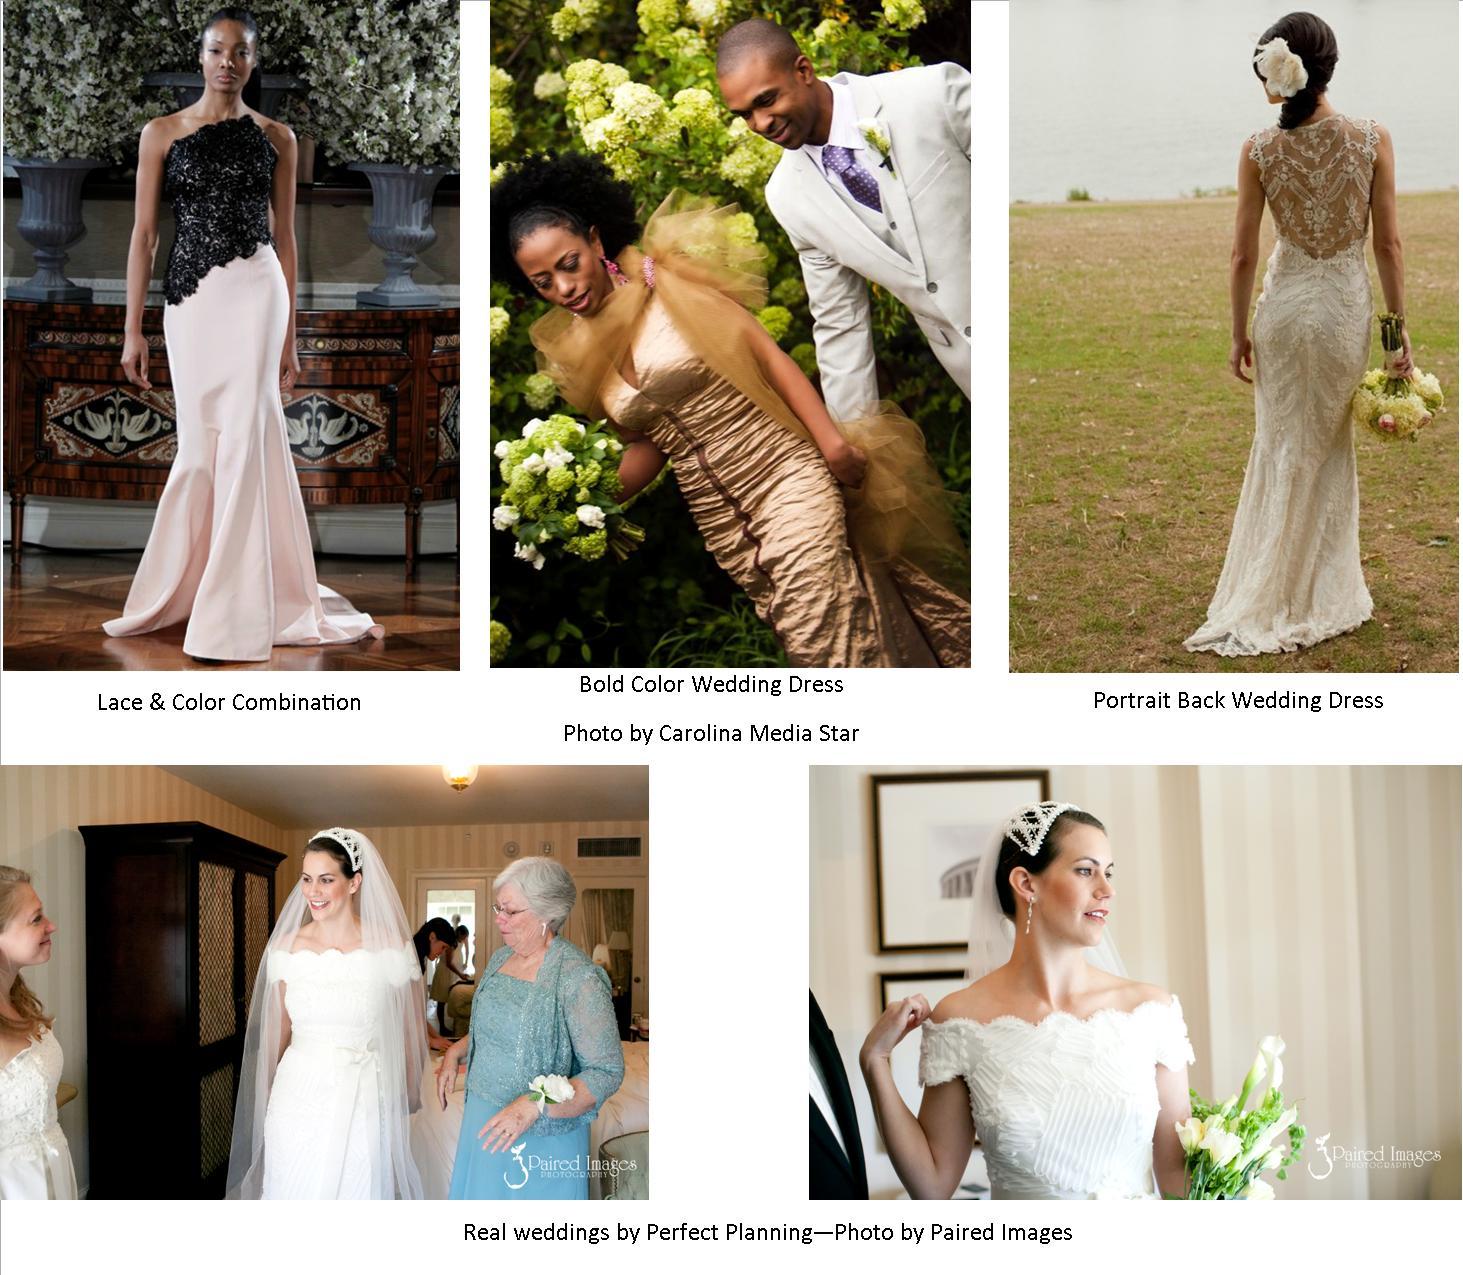 2013 Wedding Styles, Part 1…The Dress